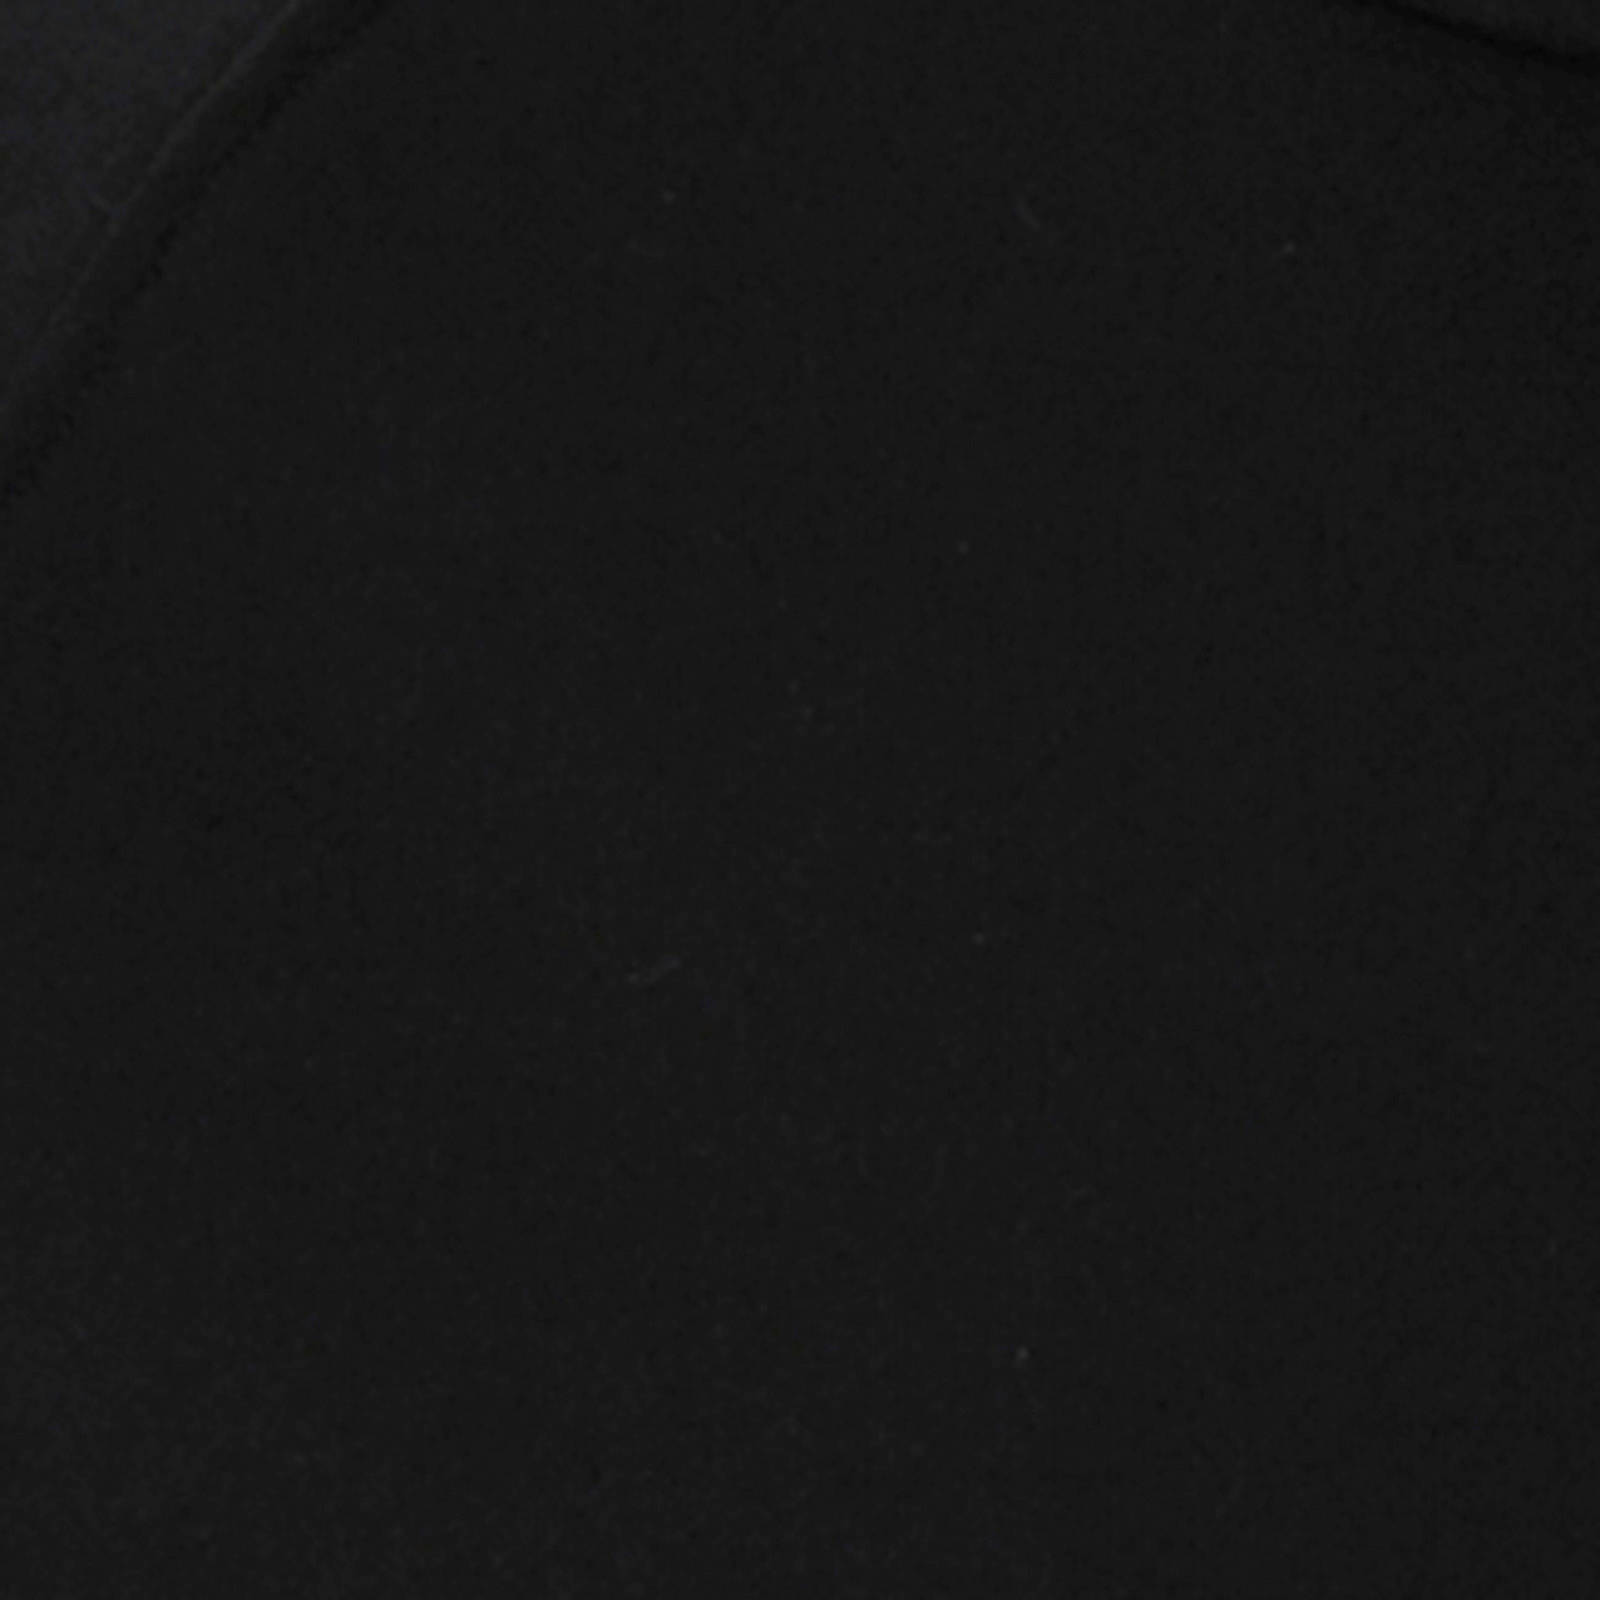 G G Star RAW hoodie Star 7S6qn7U48